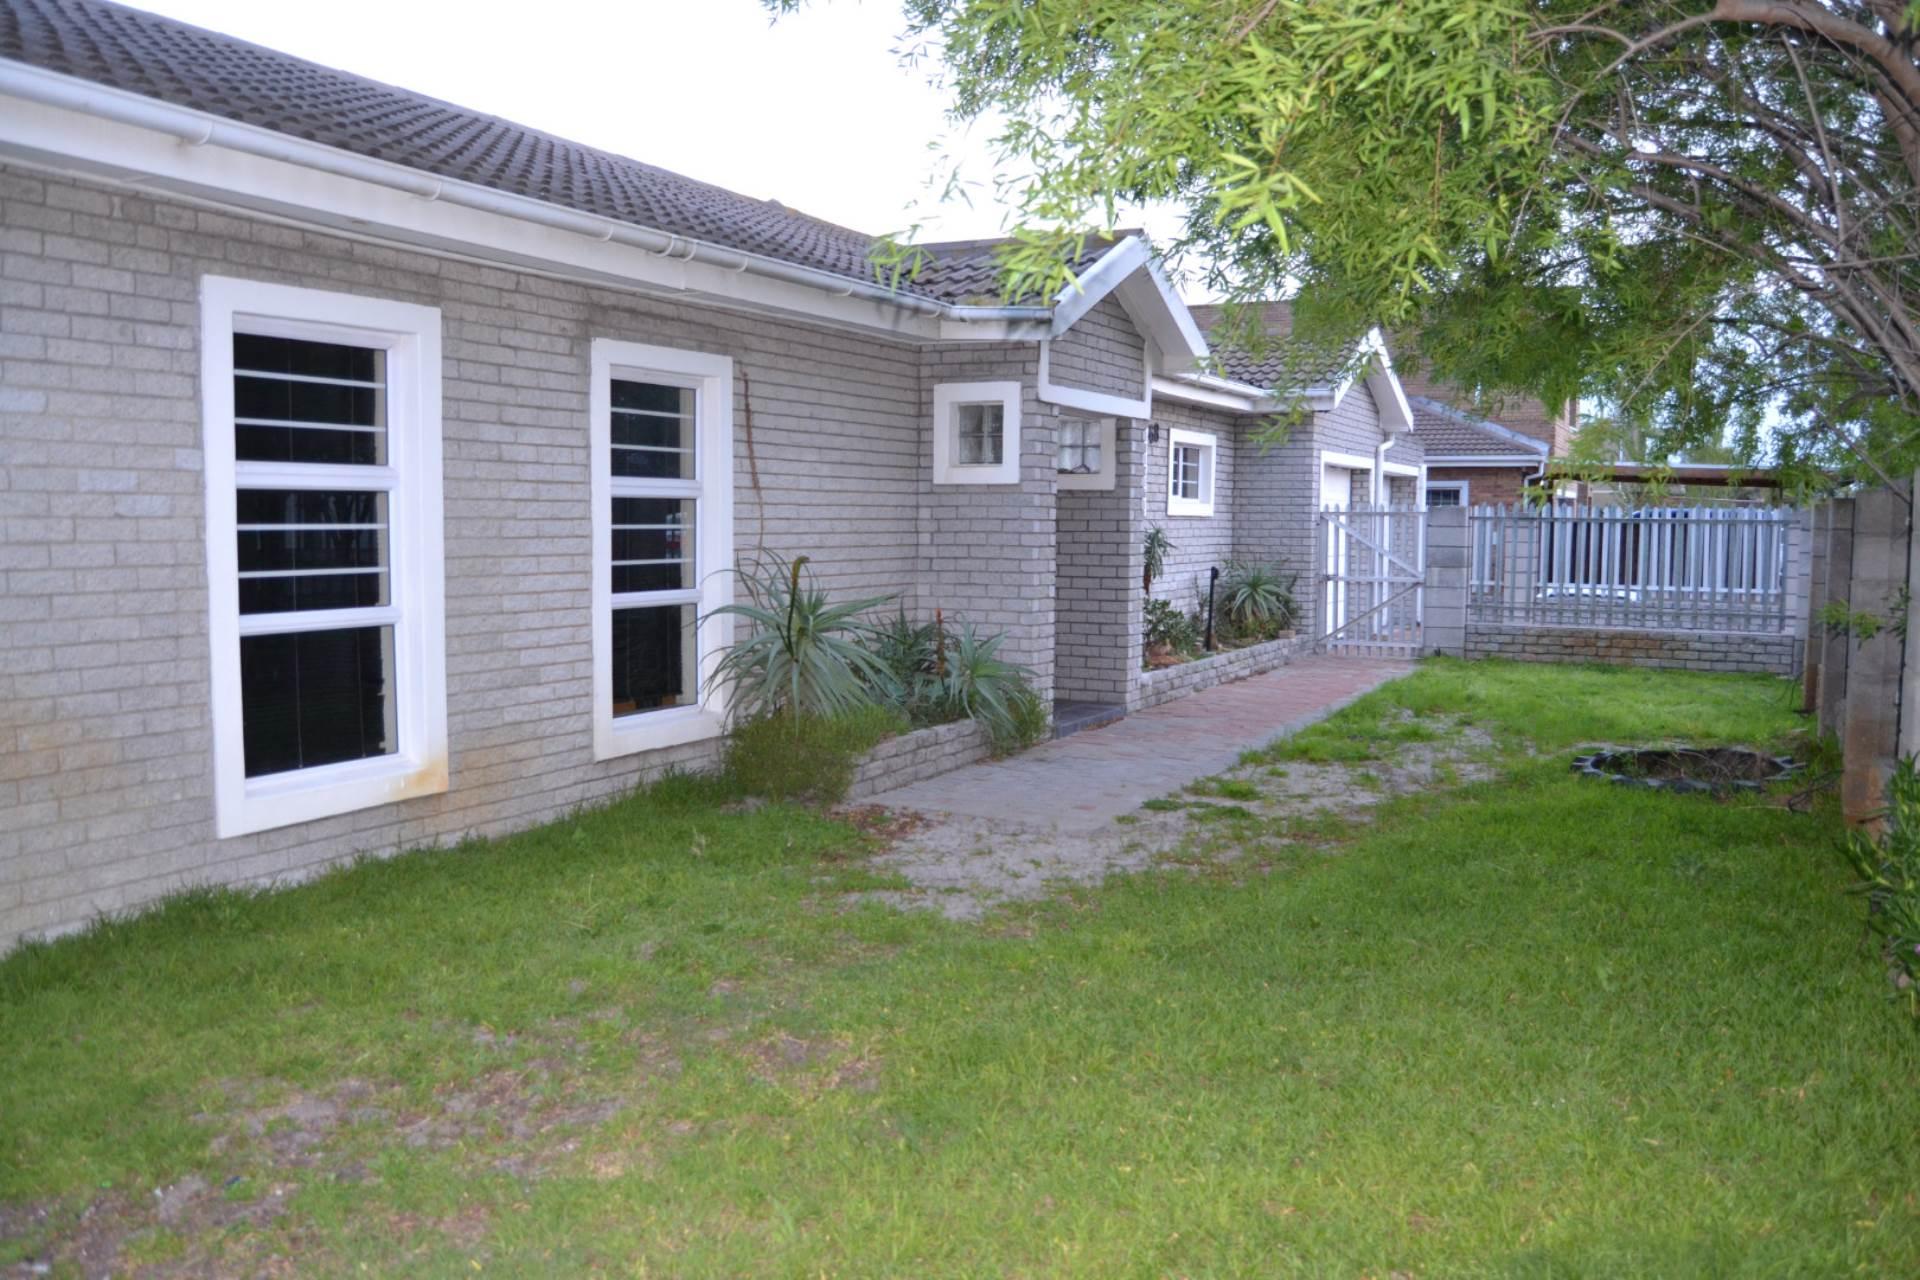 4 BedroomHouse For Sale In Soneike